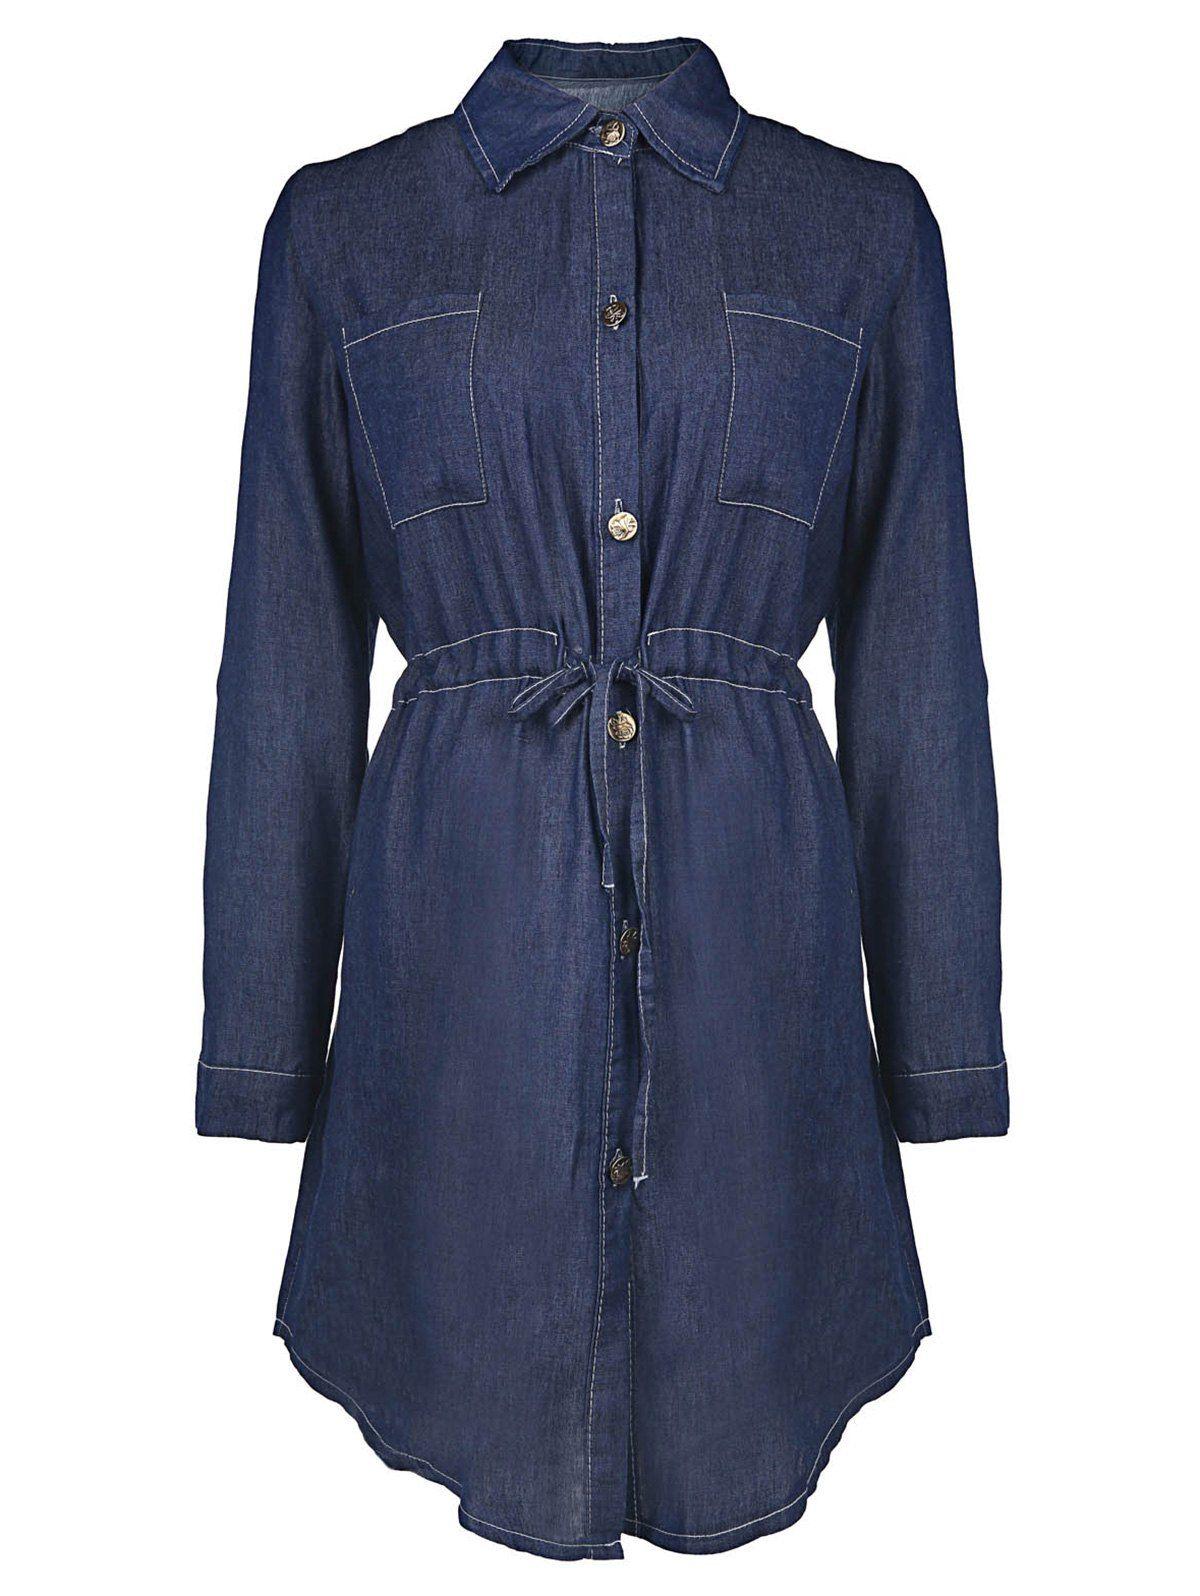 Stylish long sleeve shirt collar denim solid color womenus shirt